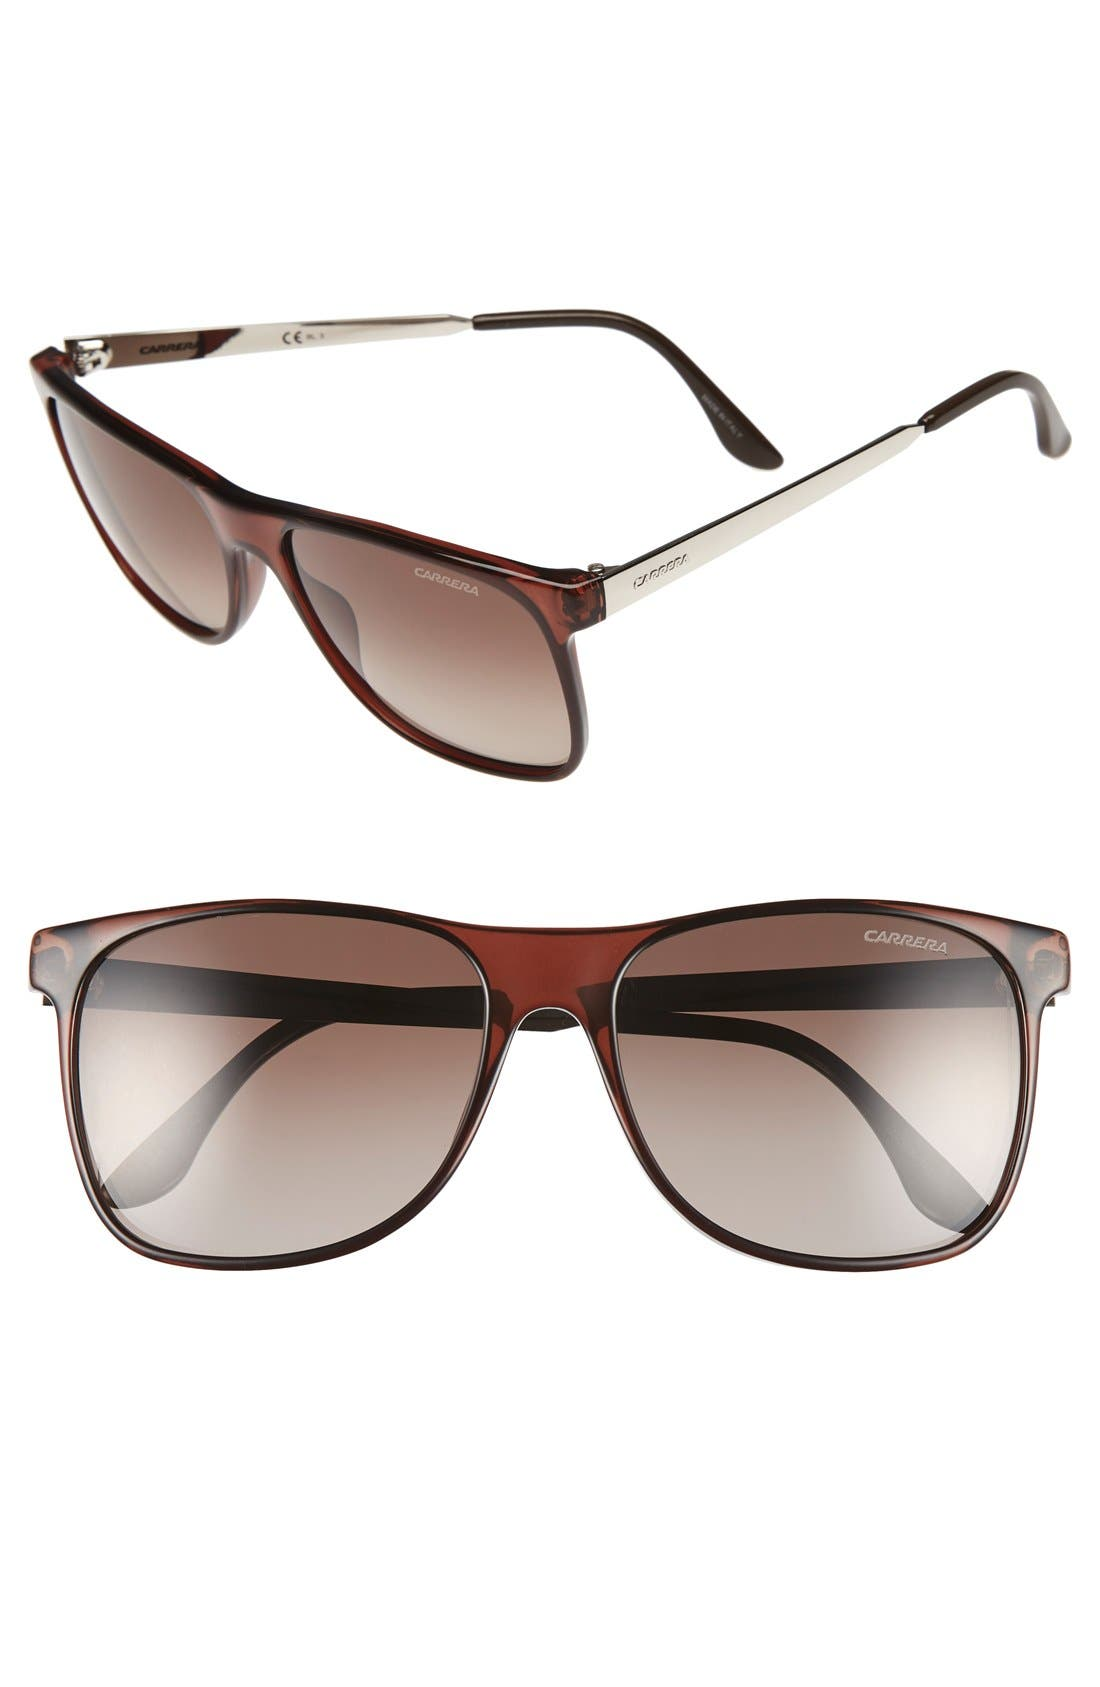 Main Image - Carrera Eyewear 57mm Polarized Sunglasses